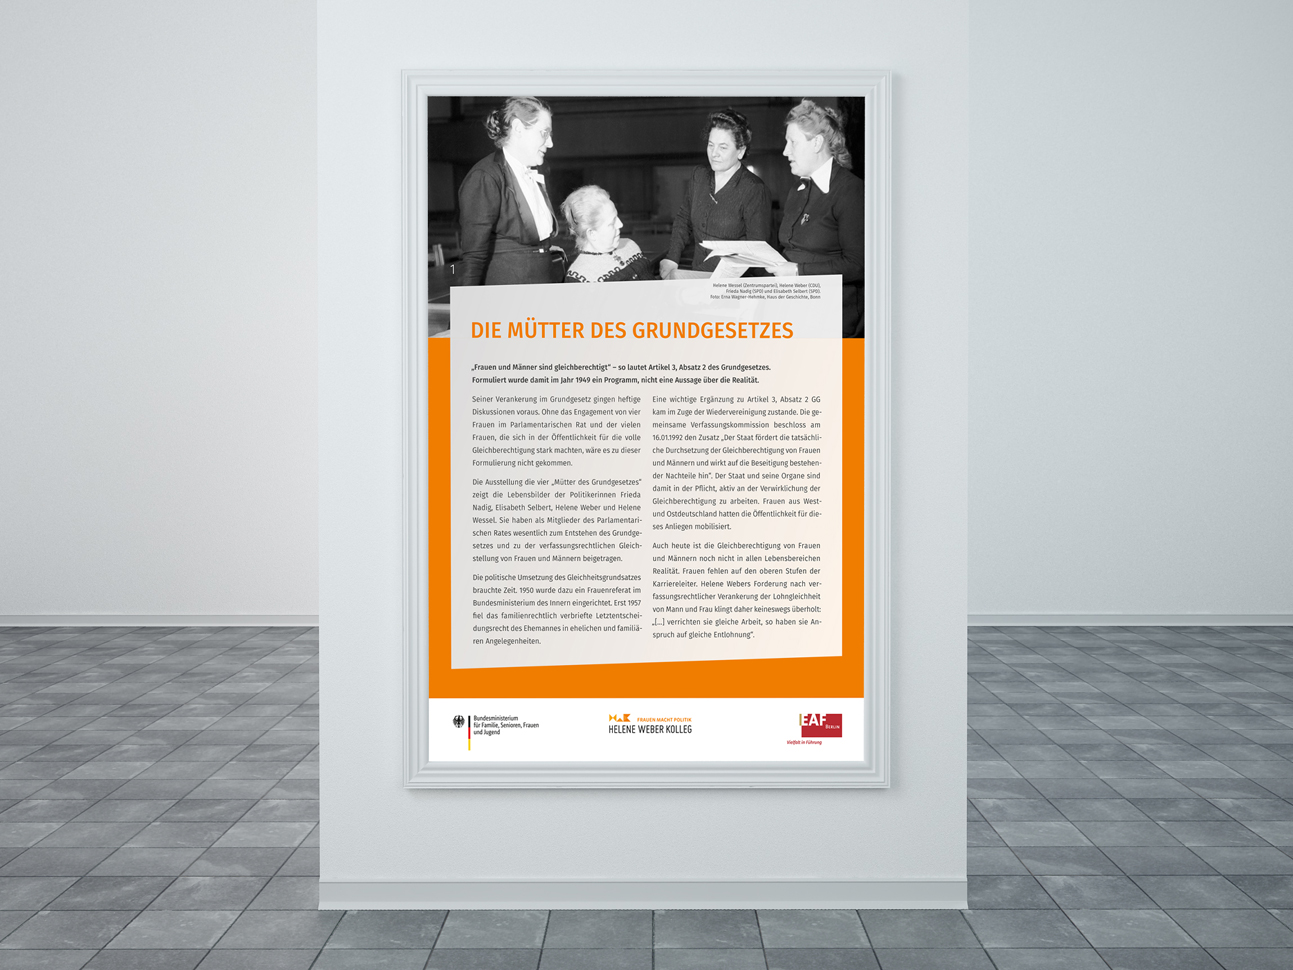 martin zech design, projekt design, mütter des grundgesetzes, titeltafel